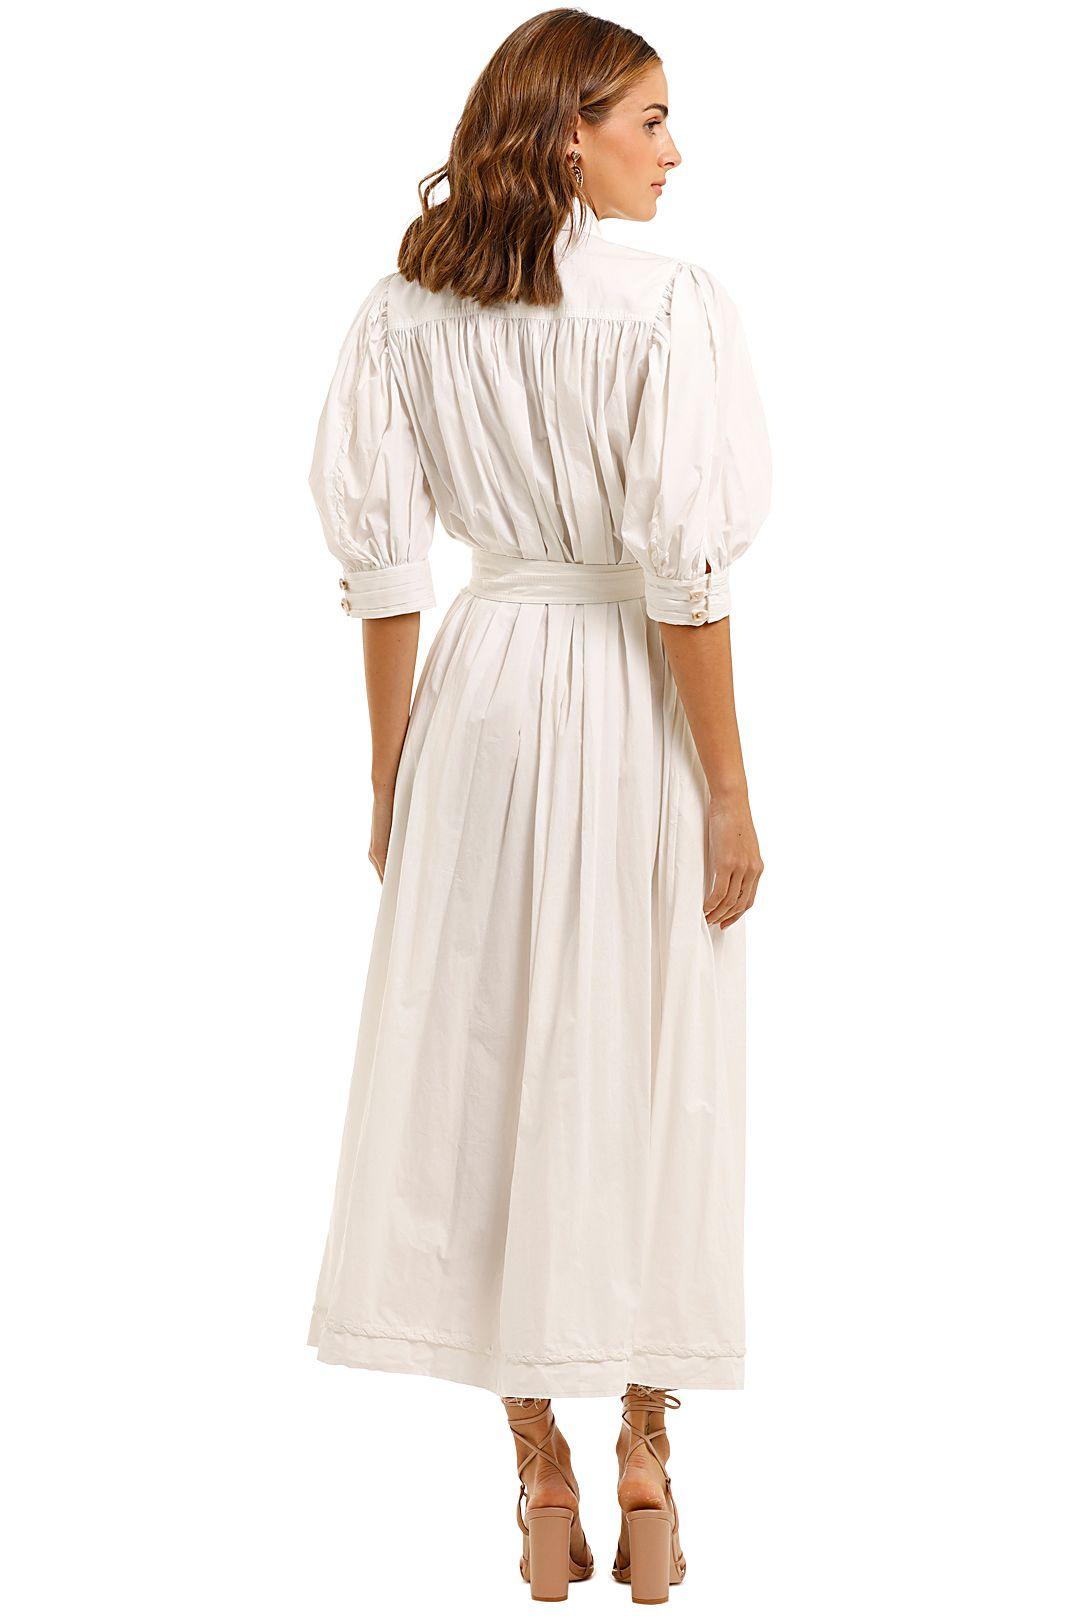 AJE Organic Manifest Dress half balloon sleeve